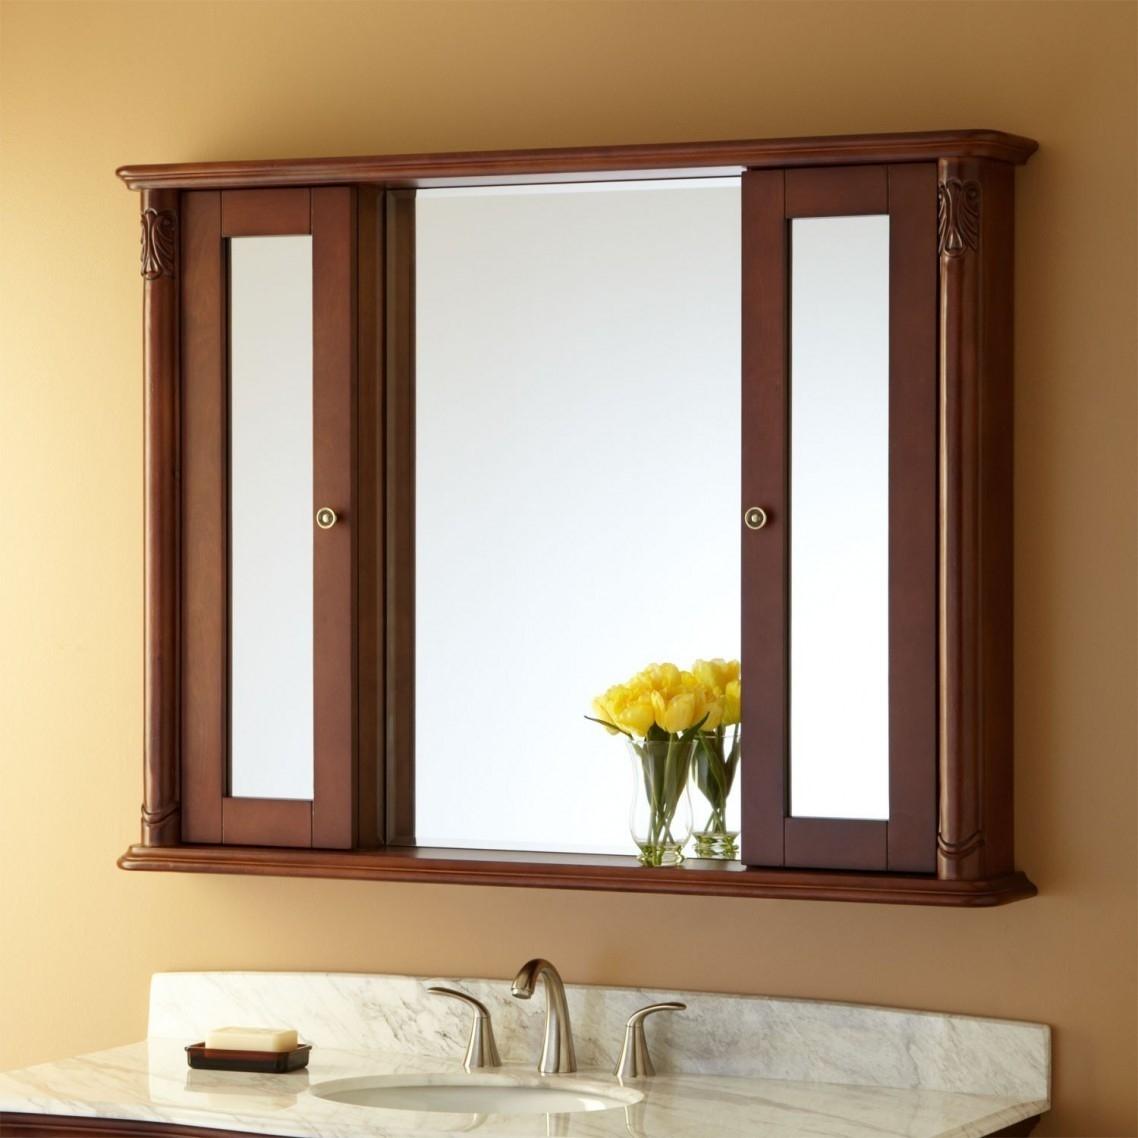 Bathroom Vanity Mirror With Shelves